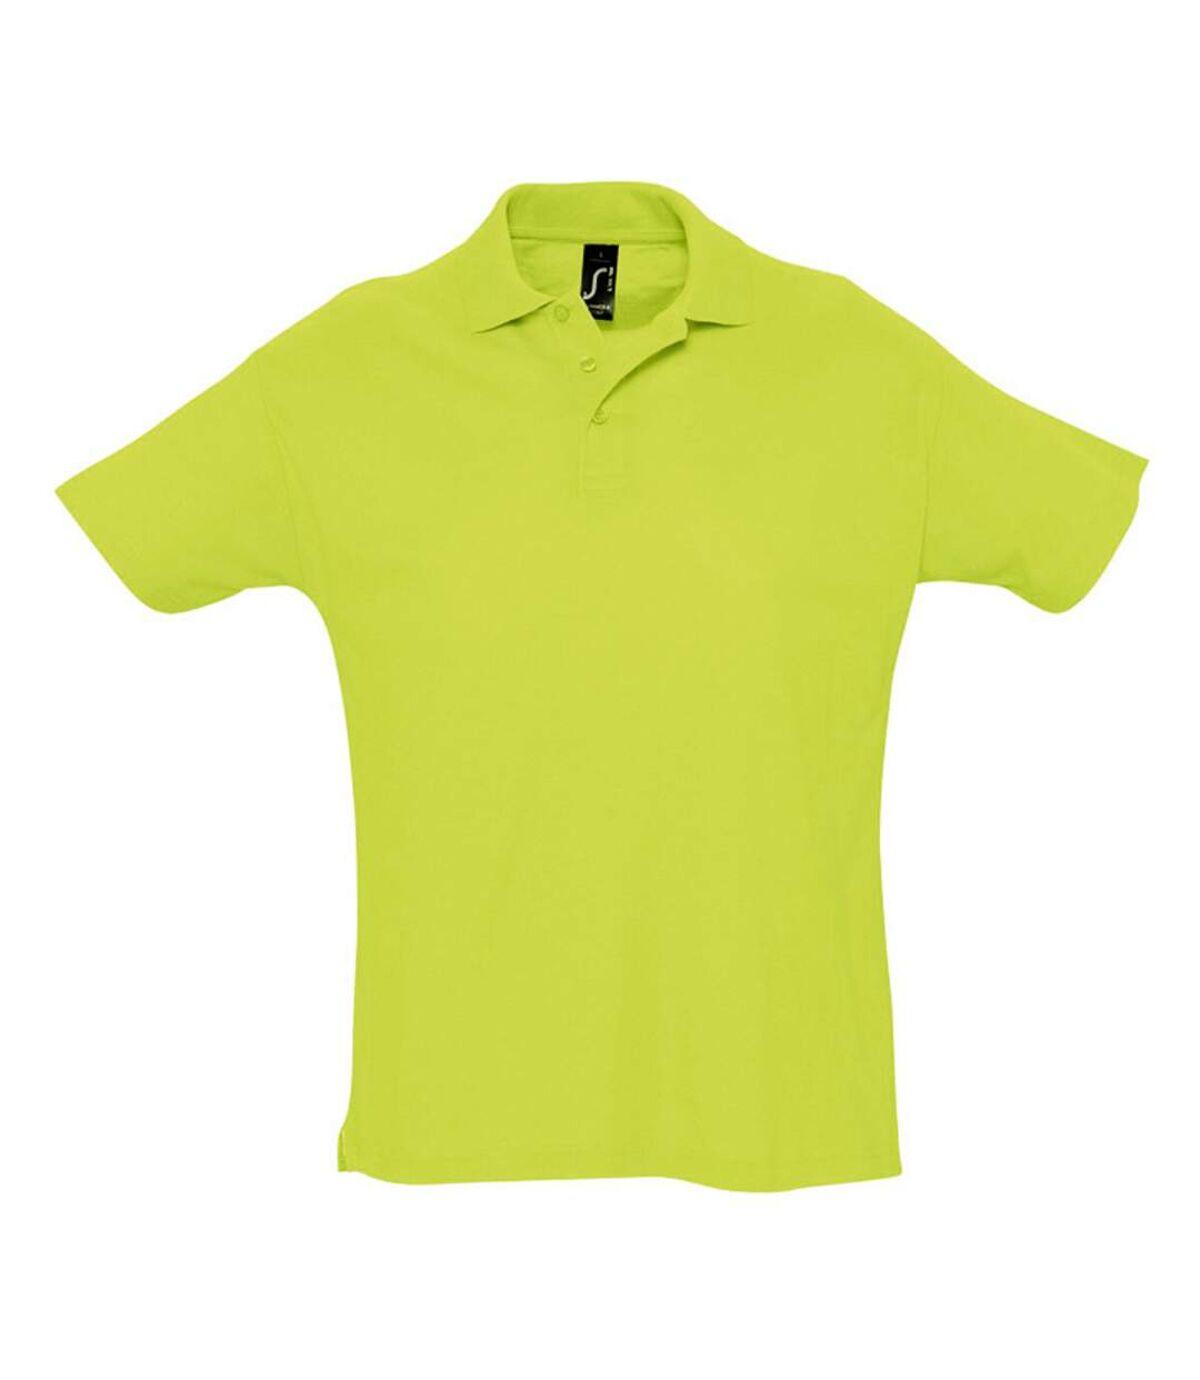 SOLS Mens Summer II Pique Short Sleeve Polo Shirt (Apple Green) - UTPC318